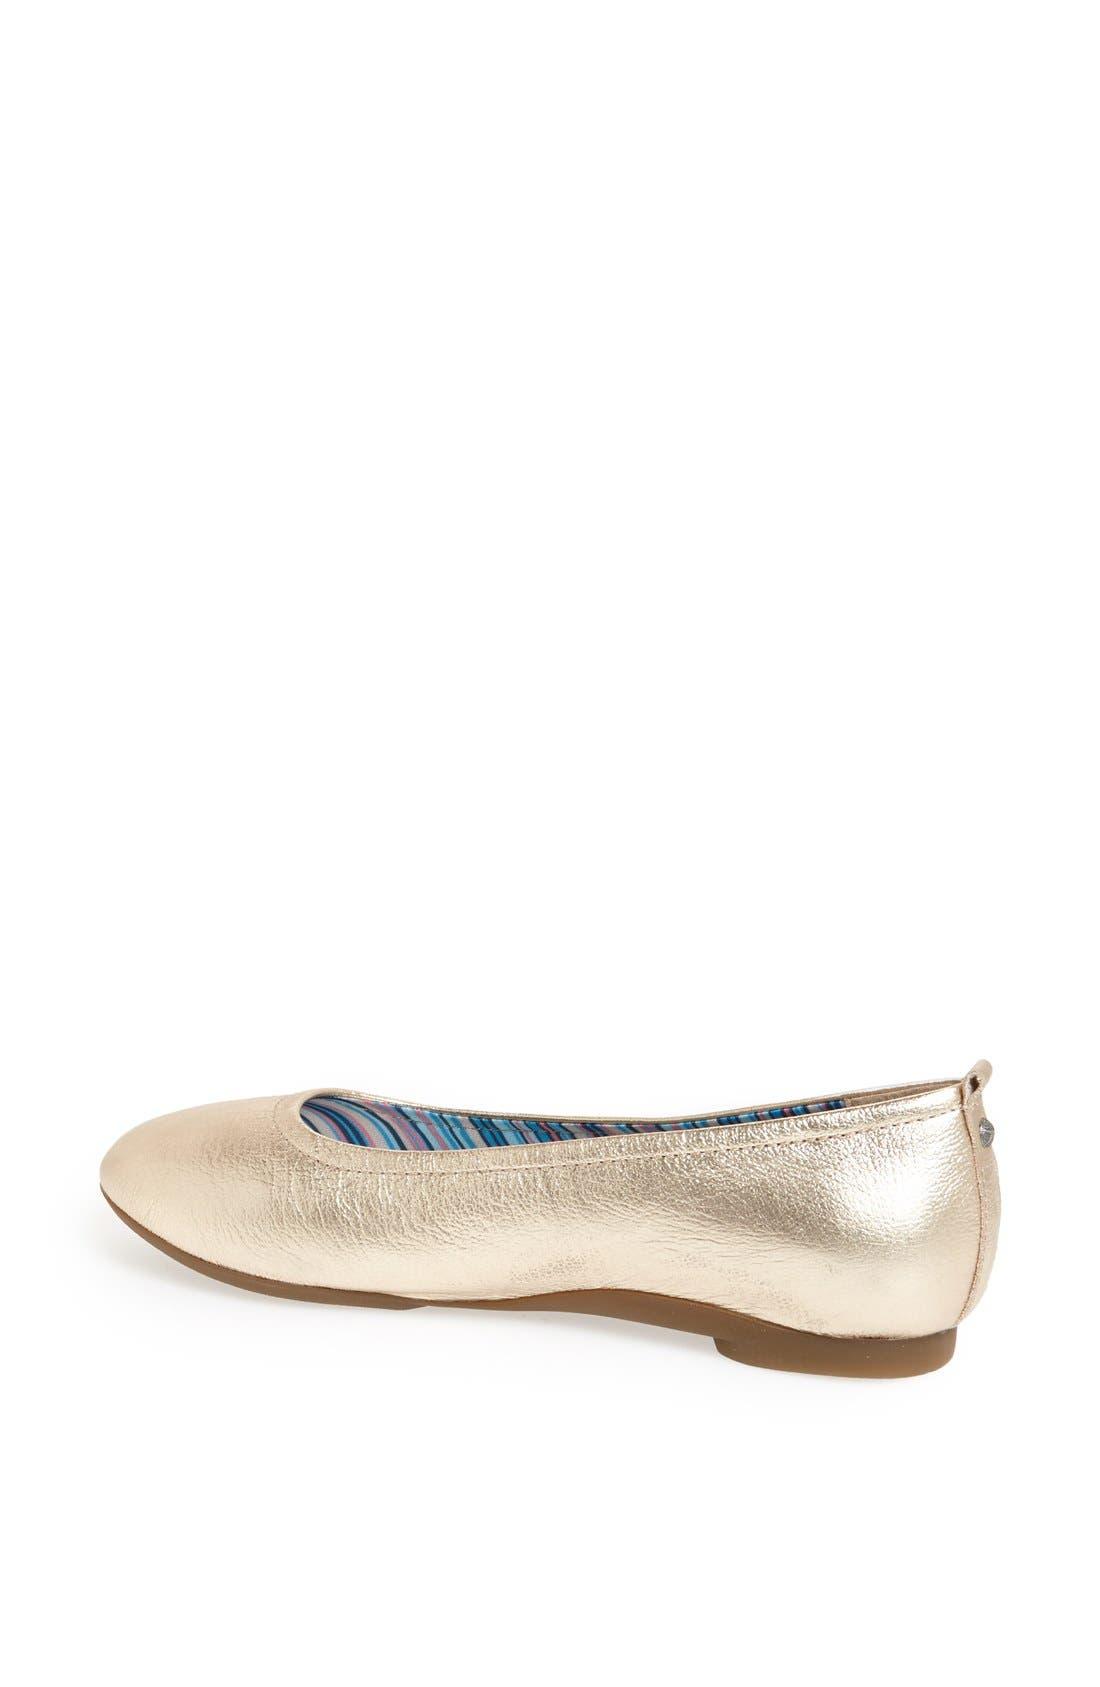 Alternate Image 2  - Aetrex 'Erica' Ballet Flat